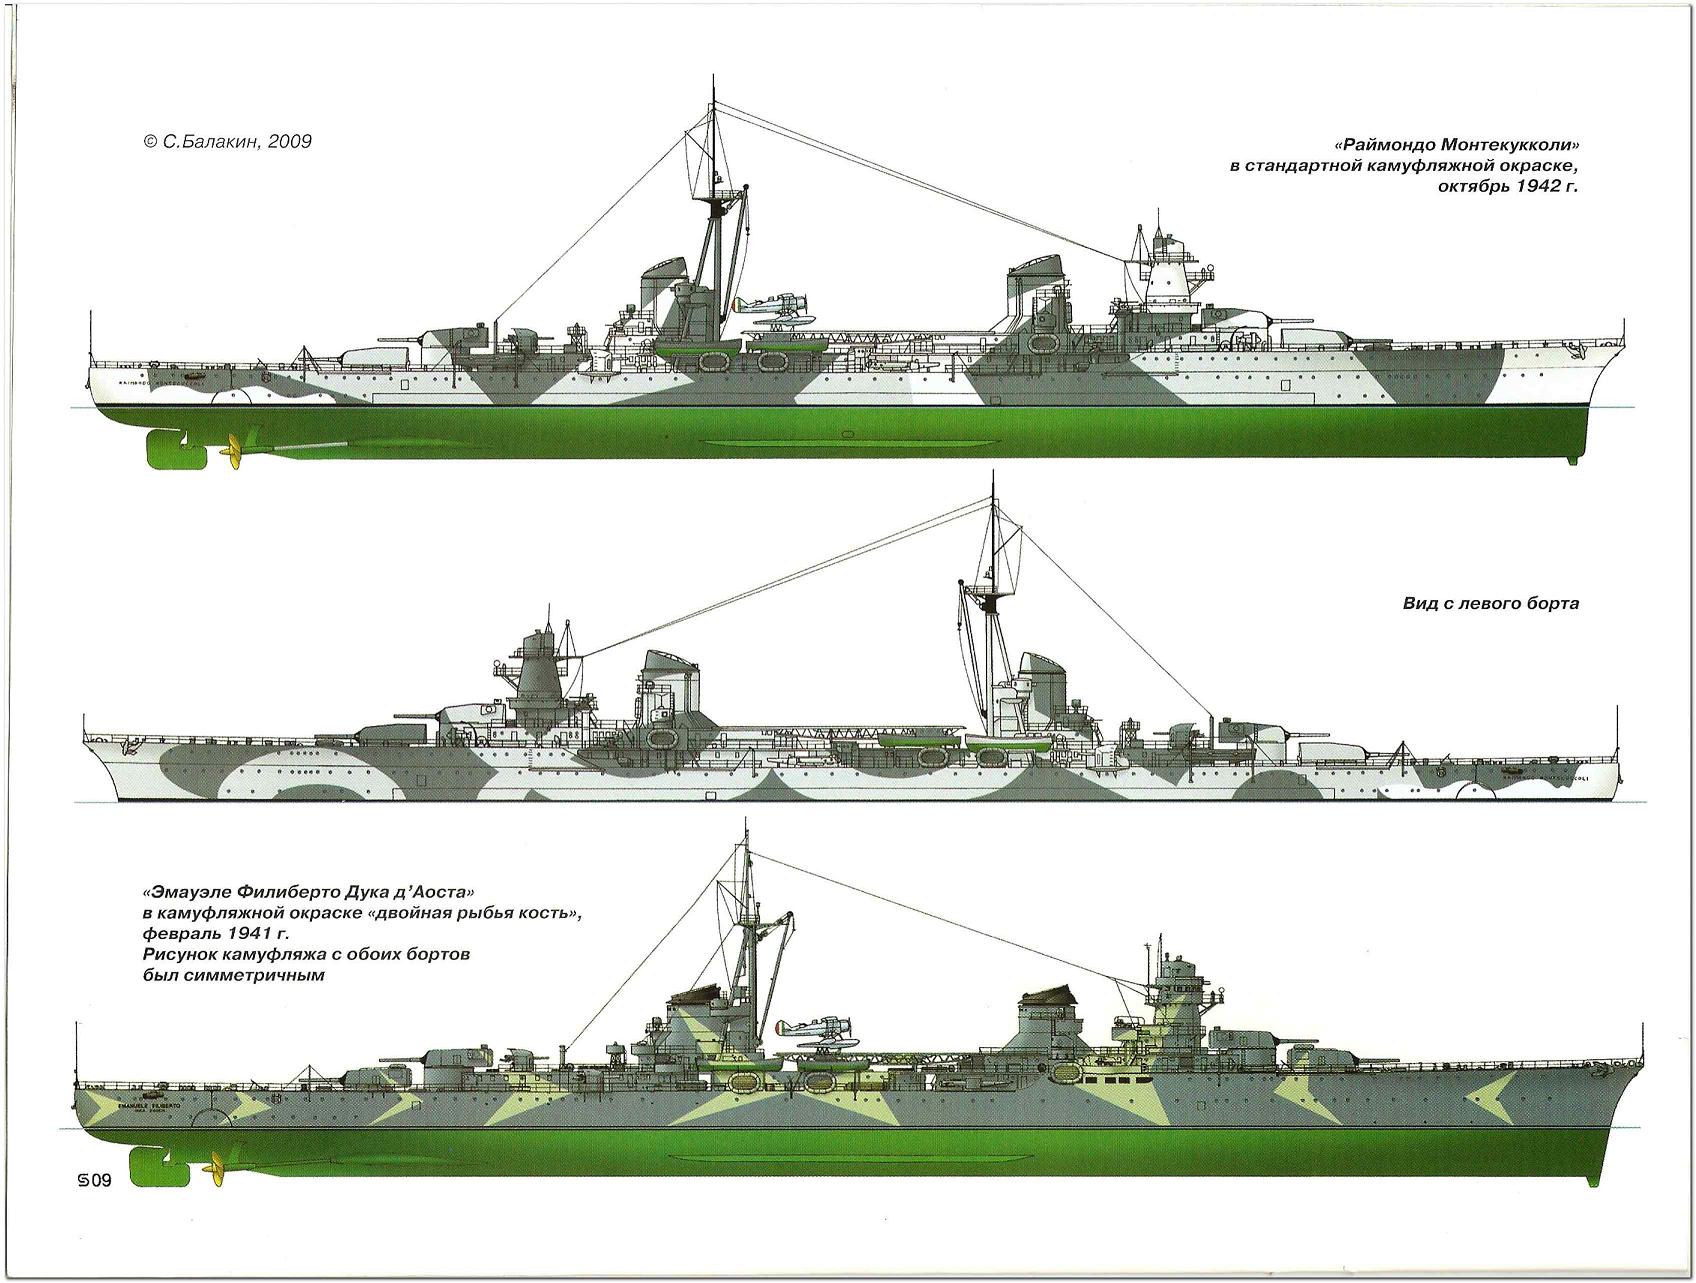 medium resolution of russian light heavy cruisers wwii 1941 1942 texas battleship diagram battleship in ww2 russian diagram